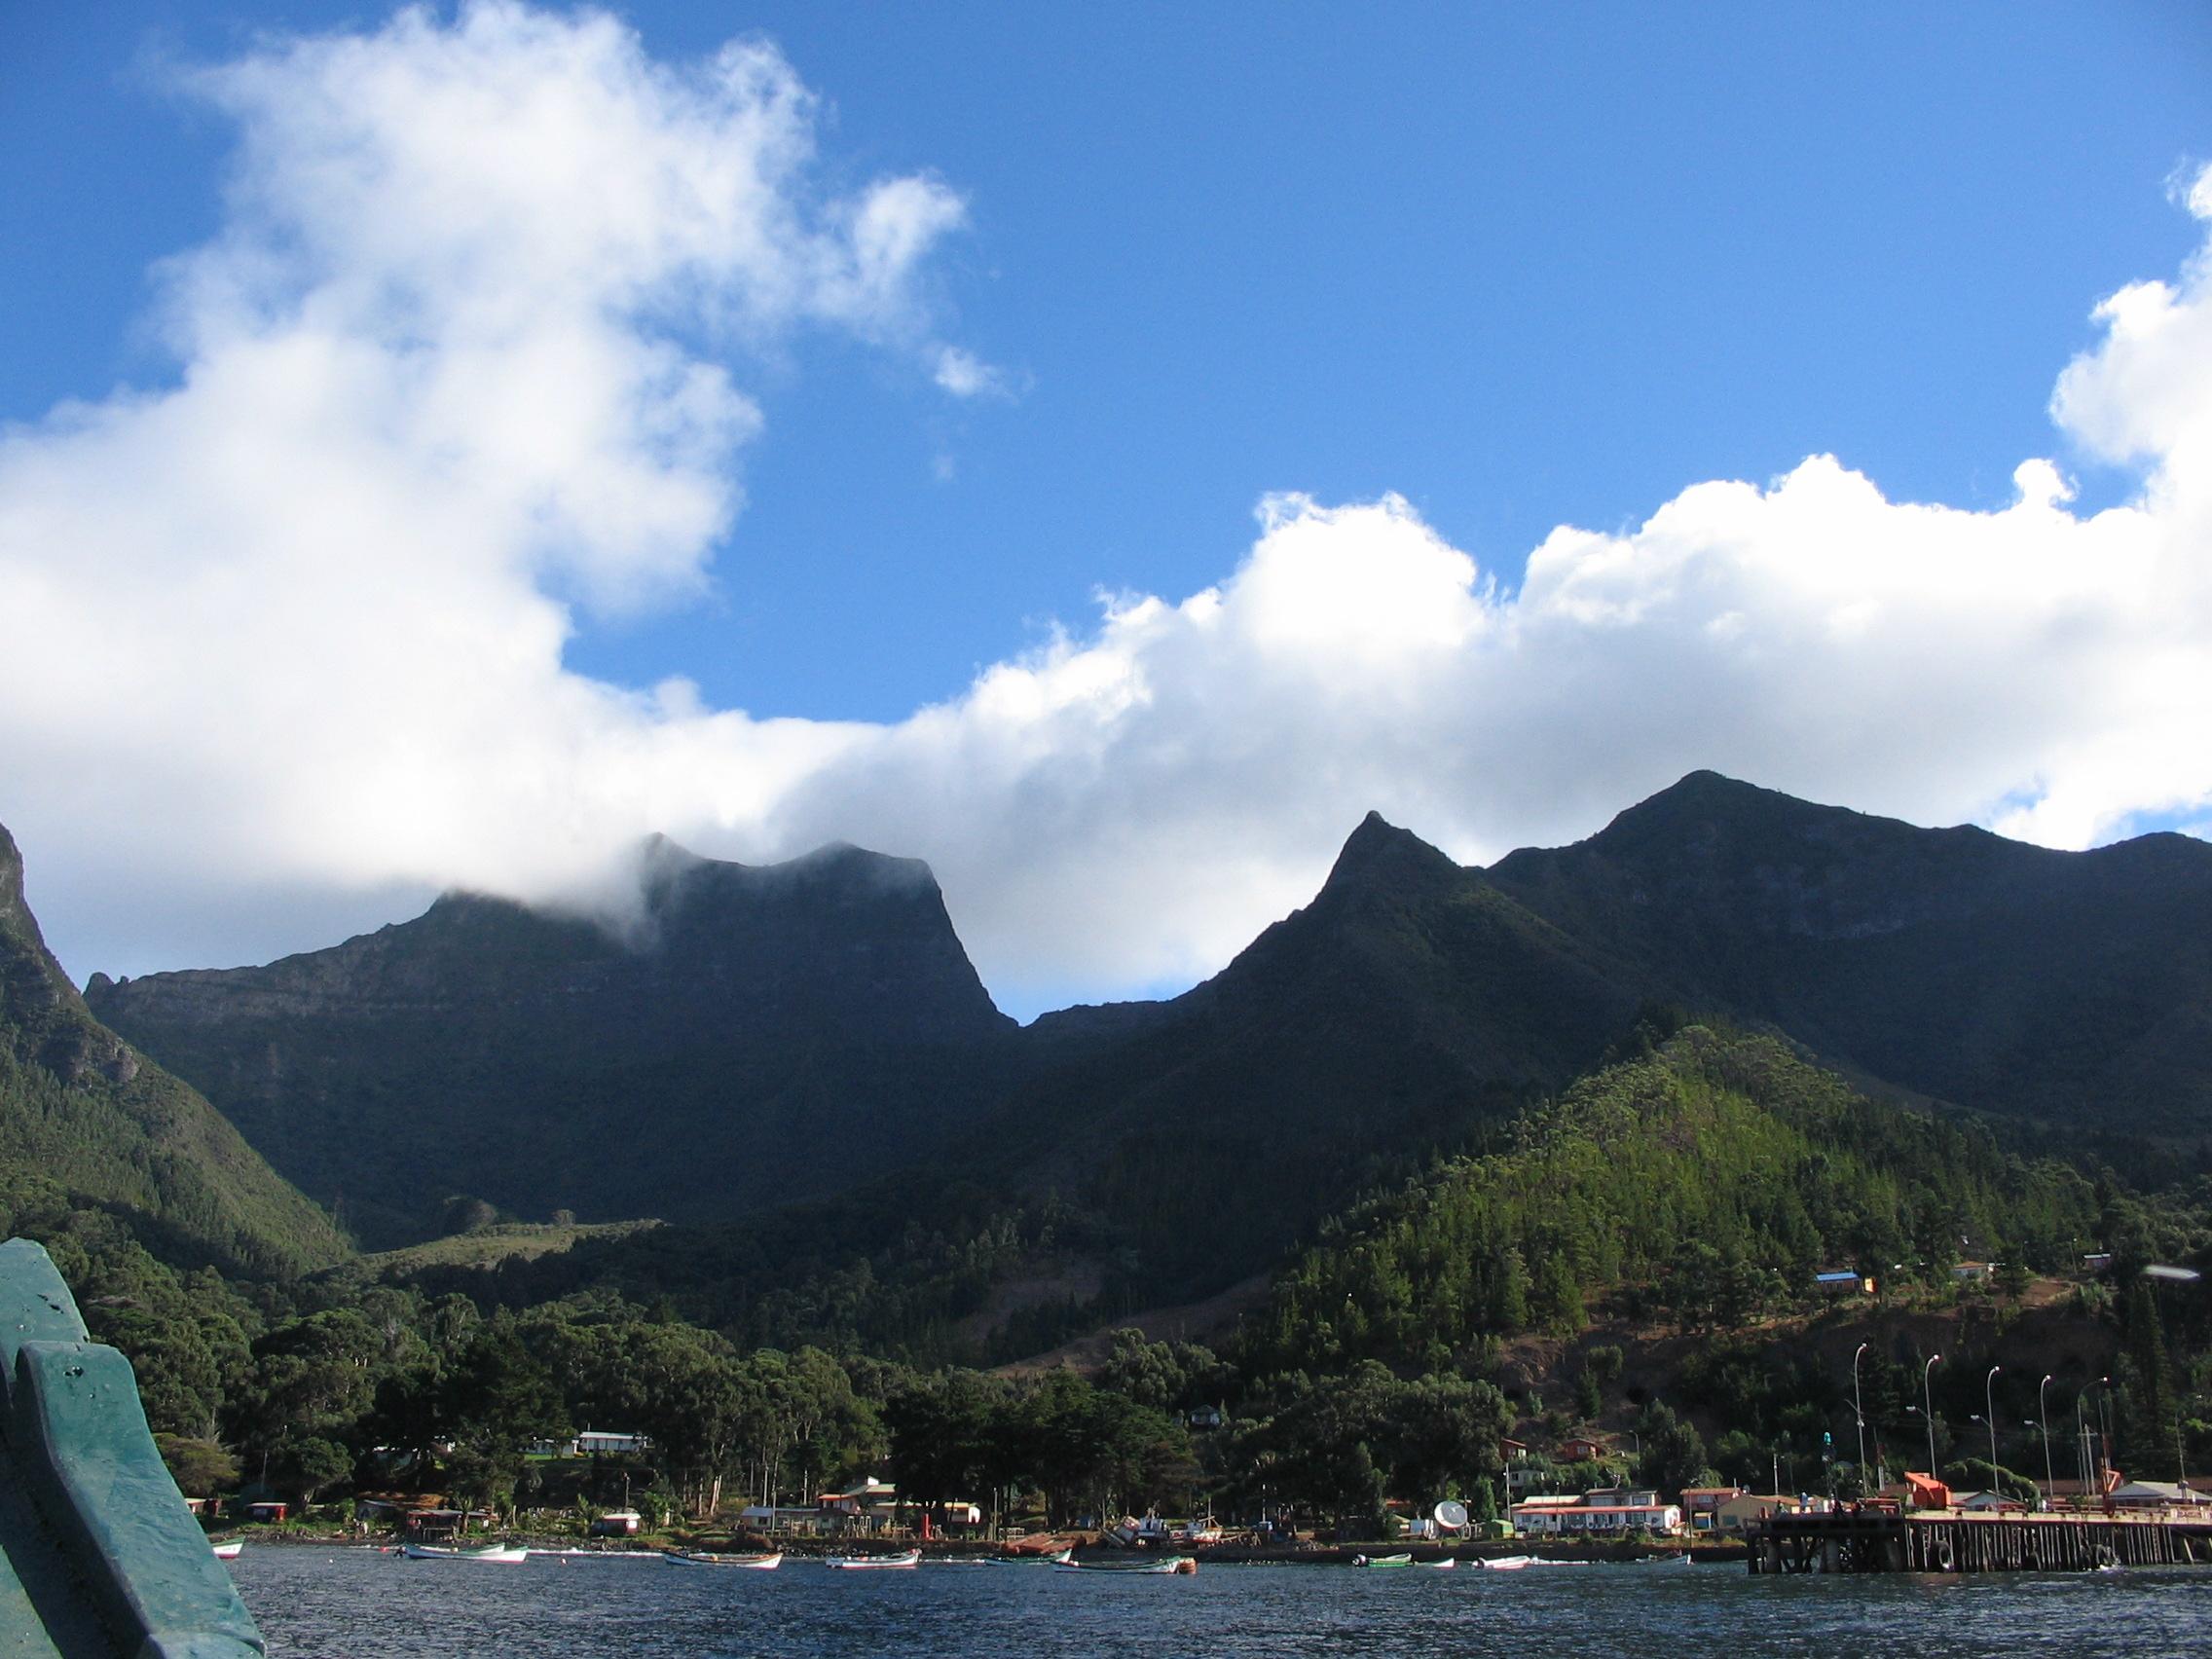 The town of San Juan Bautista on Robinson Crusoe Island, Chile. Photo taken on April 15, 2005.